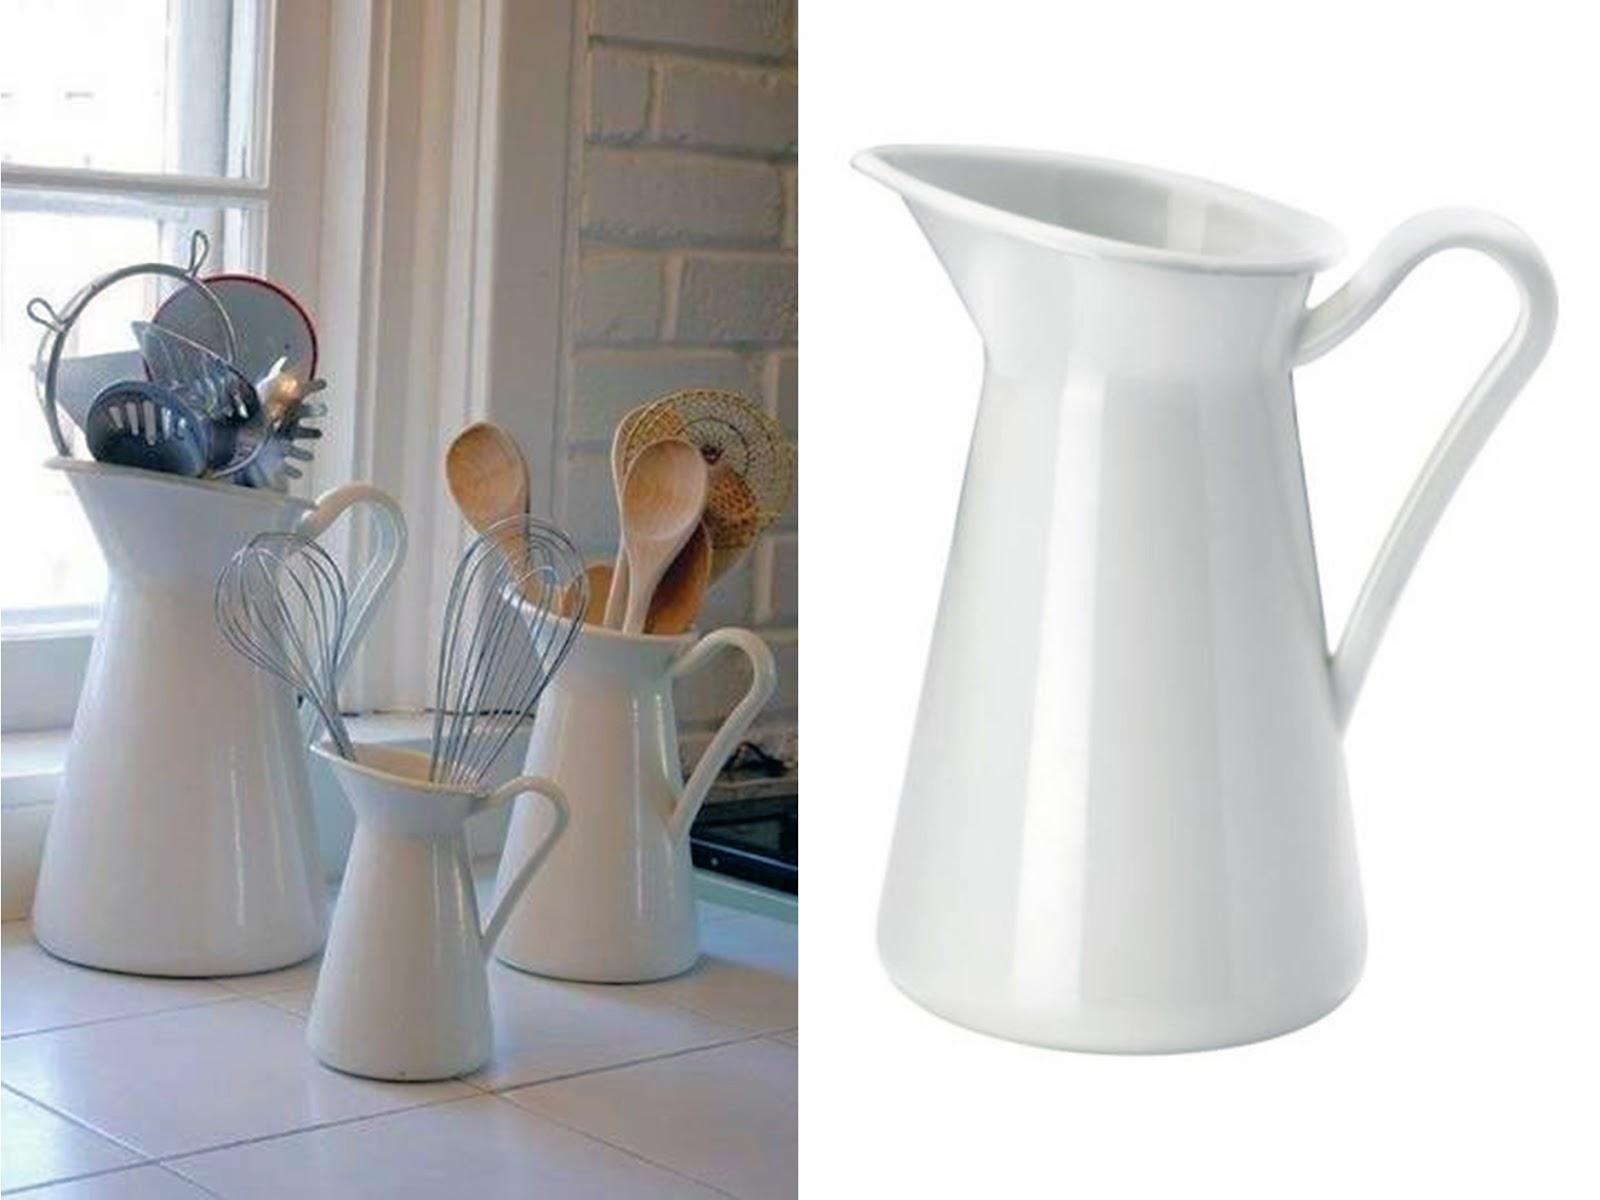 Deco ideas ikea sand by lonneke - Utensilios de cocina ikea ...